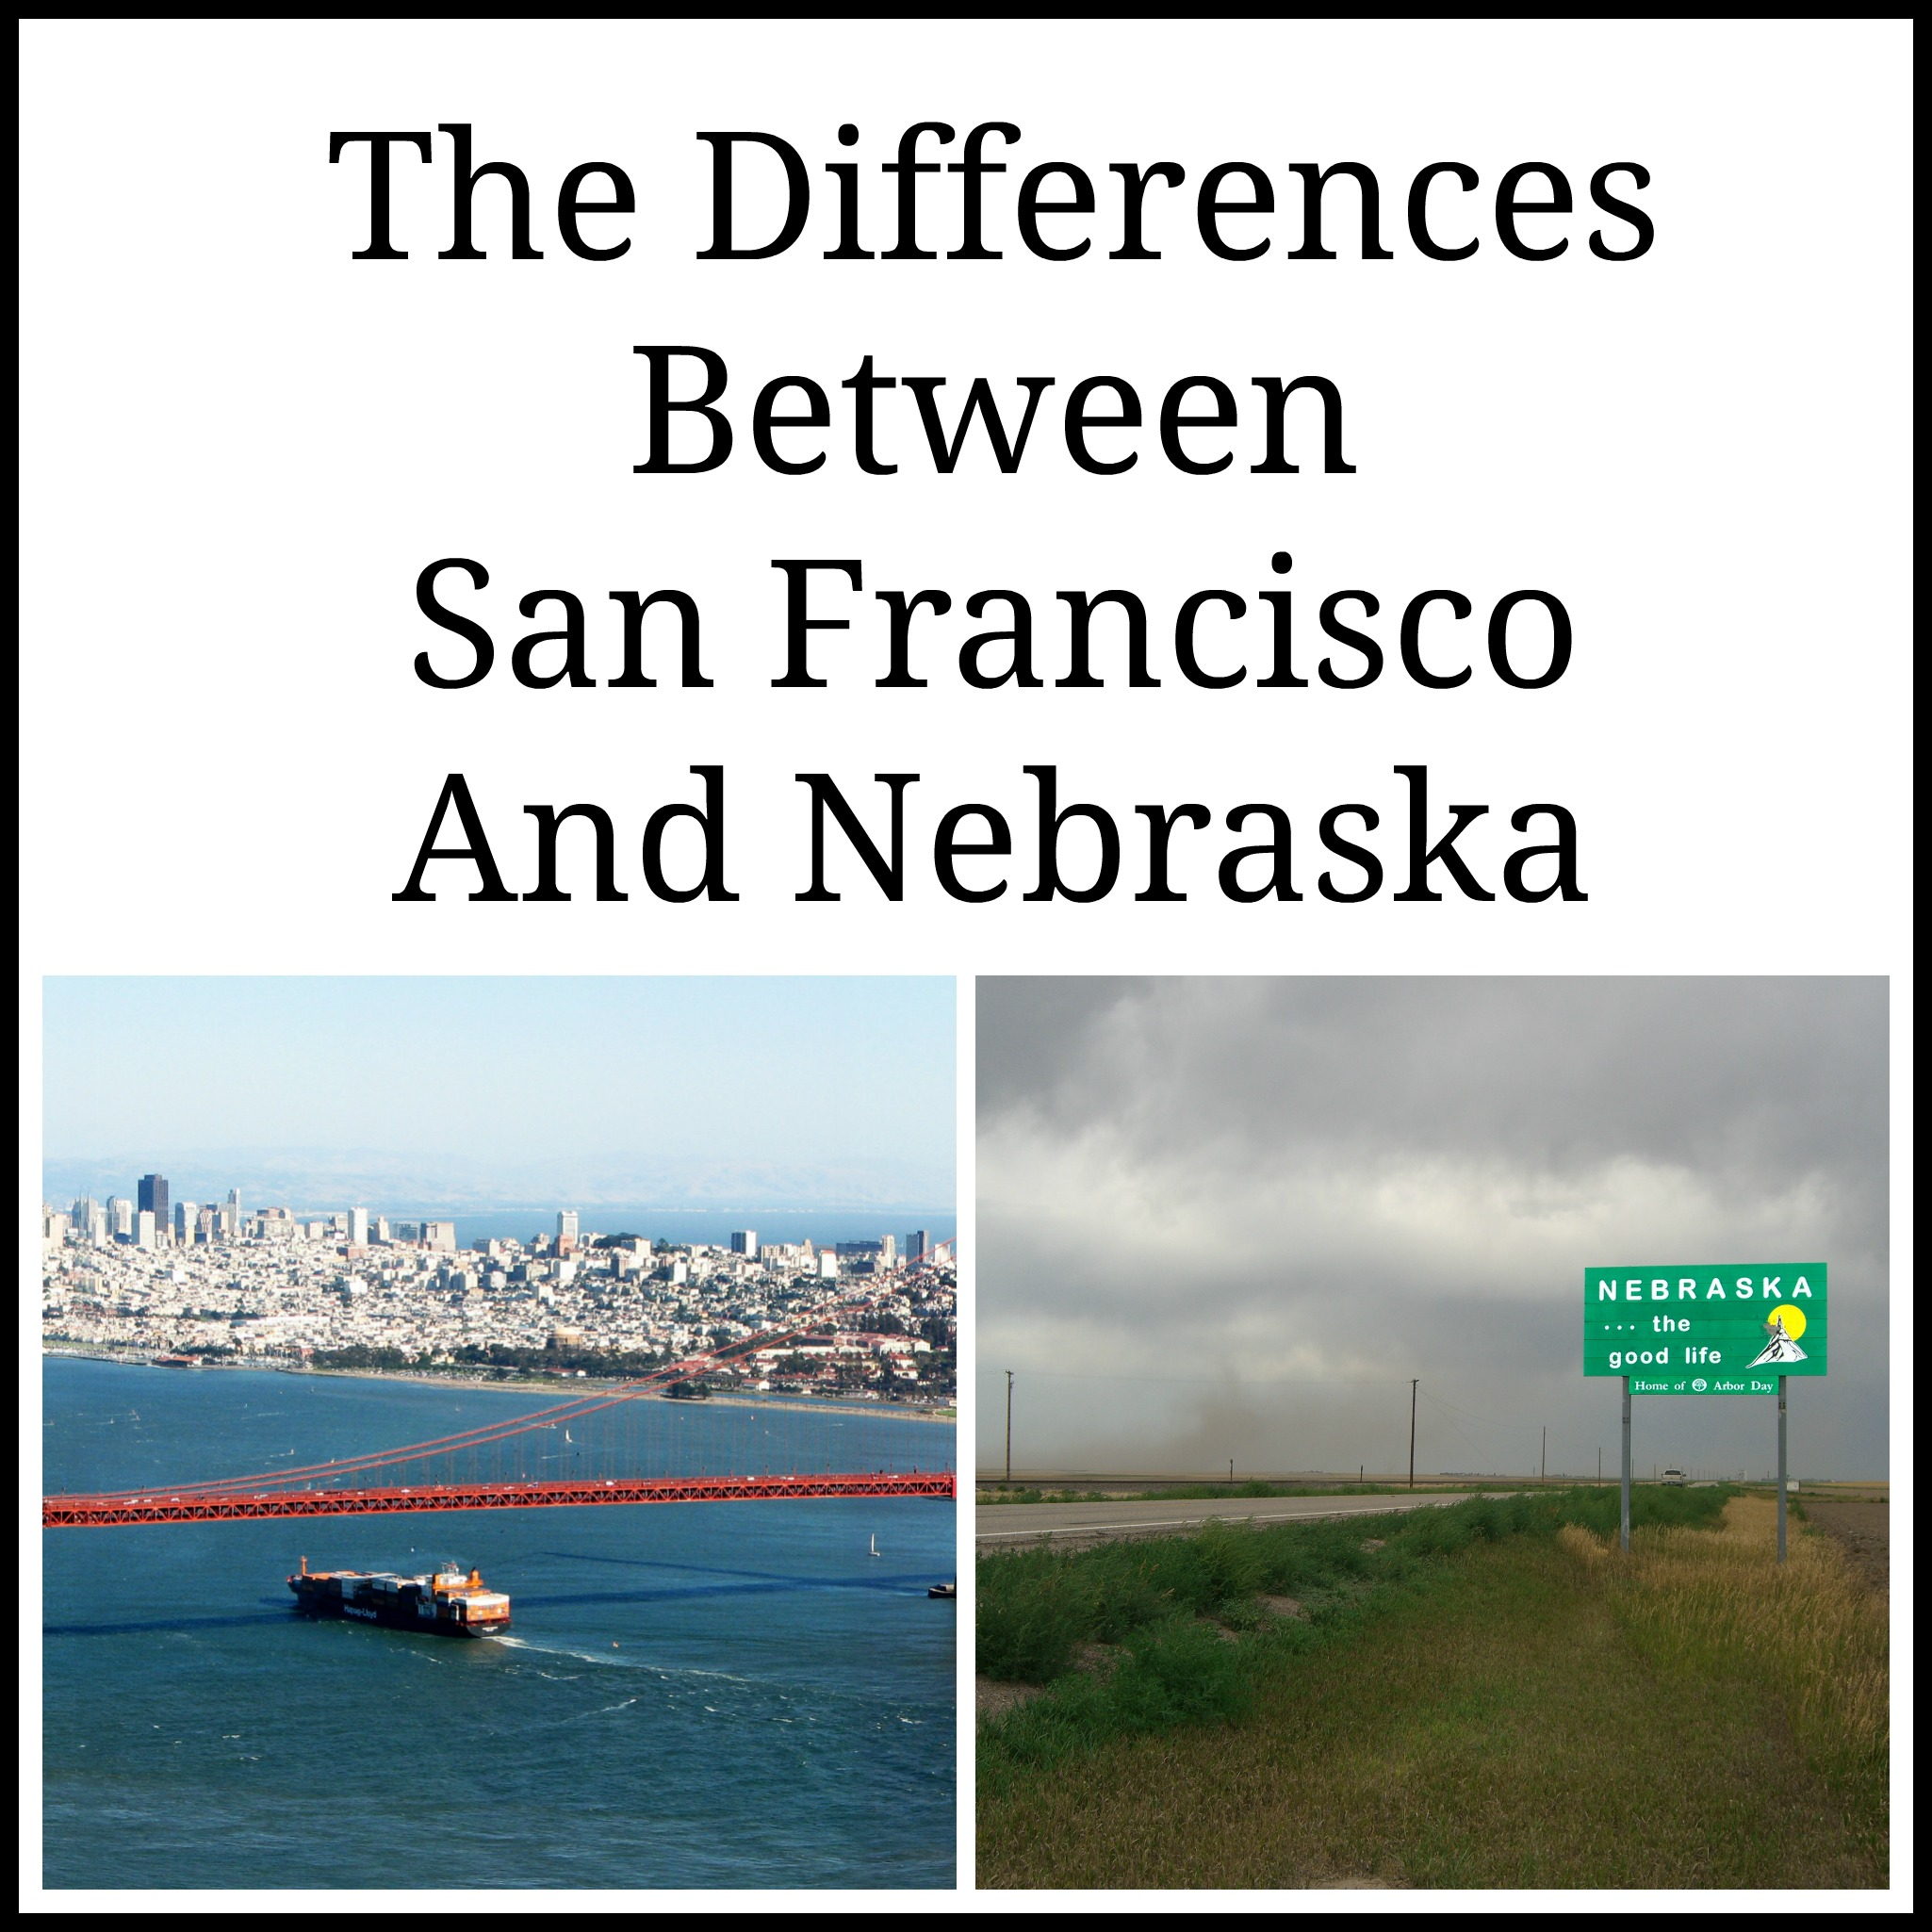 Differences Between San Francisco And Nebraska